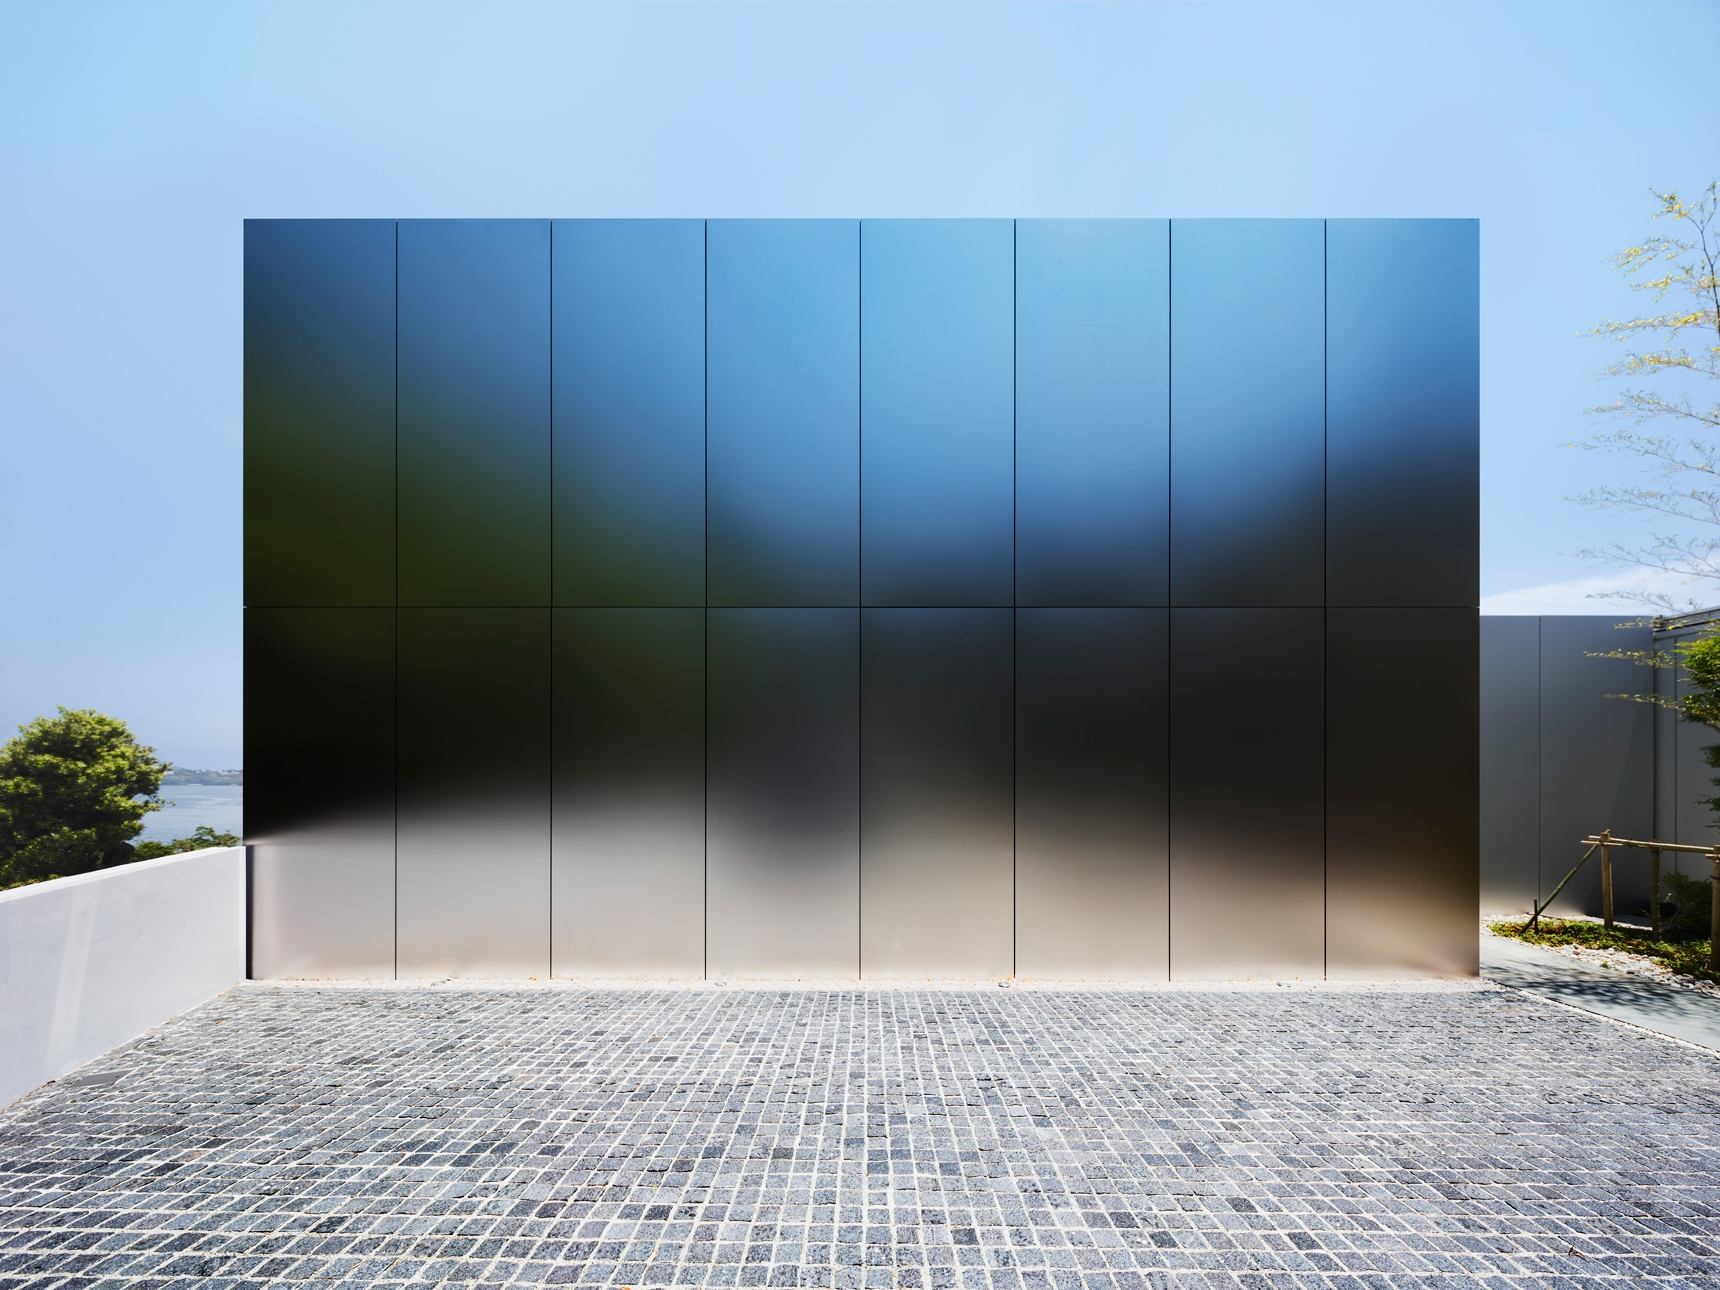 Horizon House II Shinichi Ogawa - minimalissimo | ello